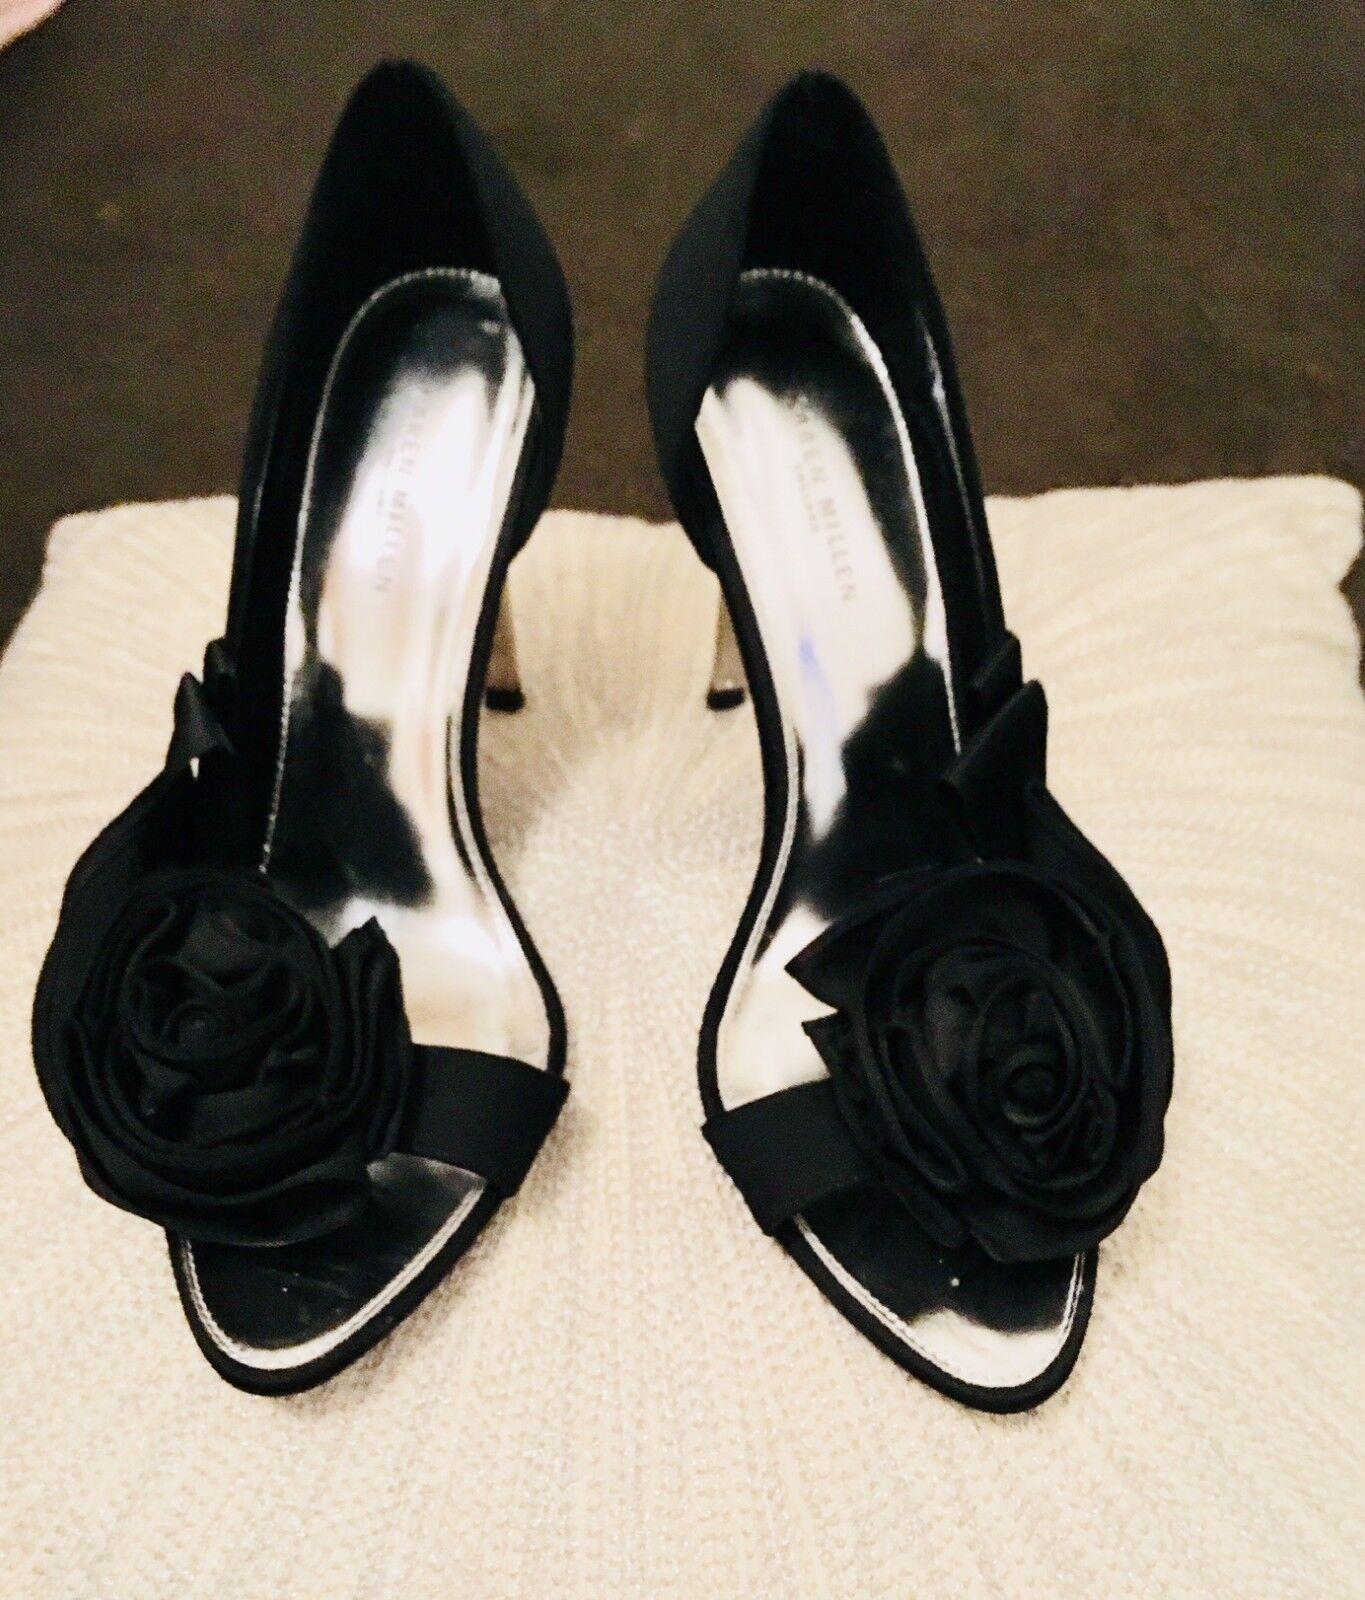 Karen Millen Femmes Taille UK 5 Satin Noir Talons Hauts Avec Rose Détail